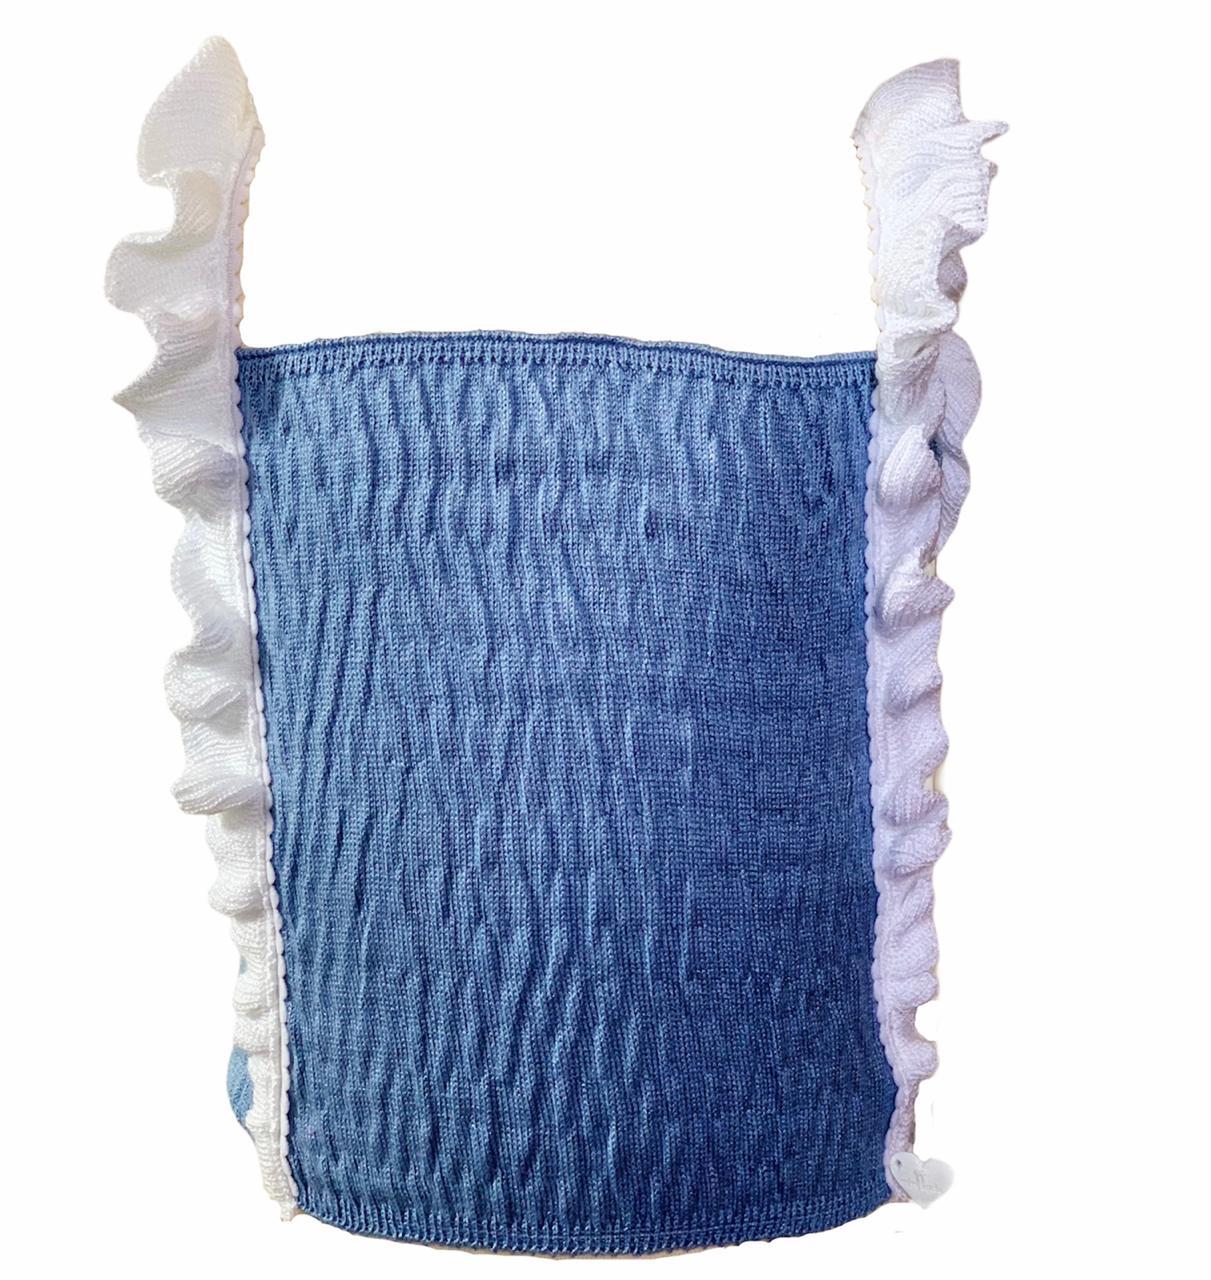 Regata Issa tricot azul